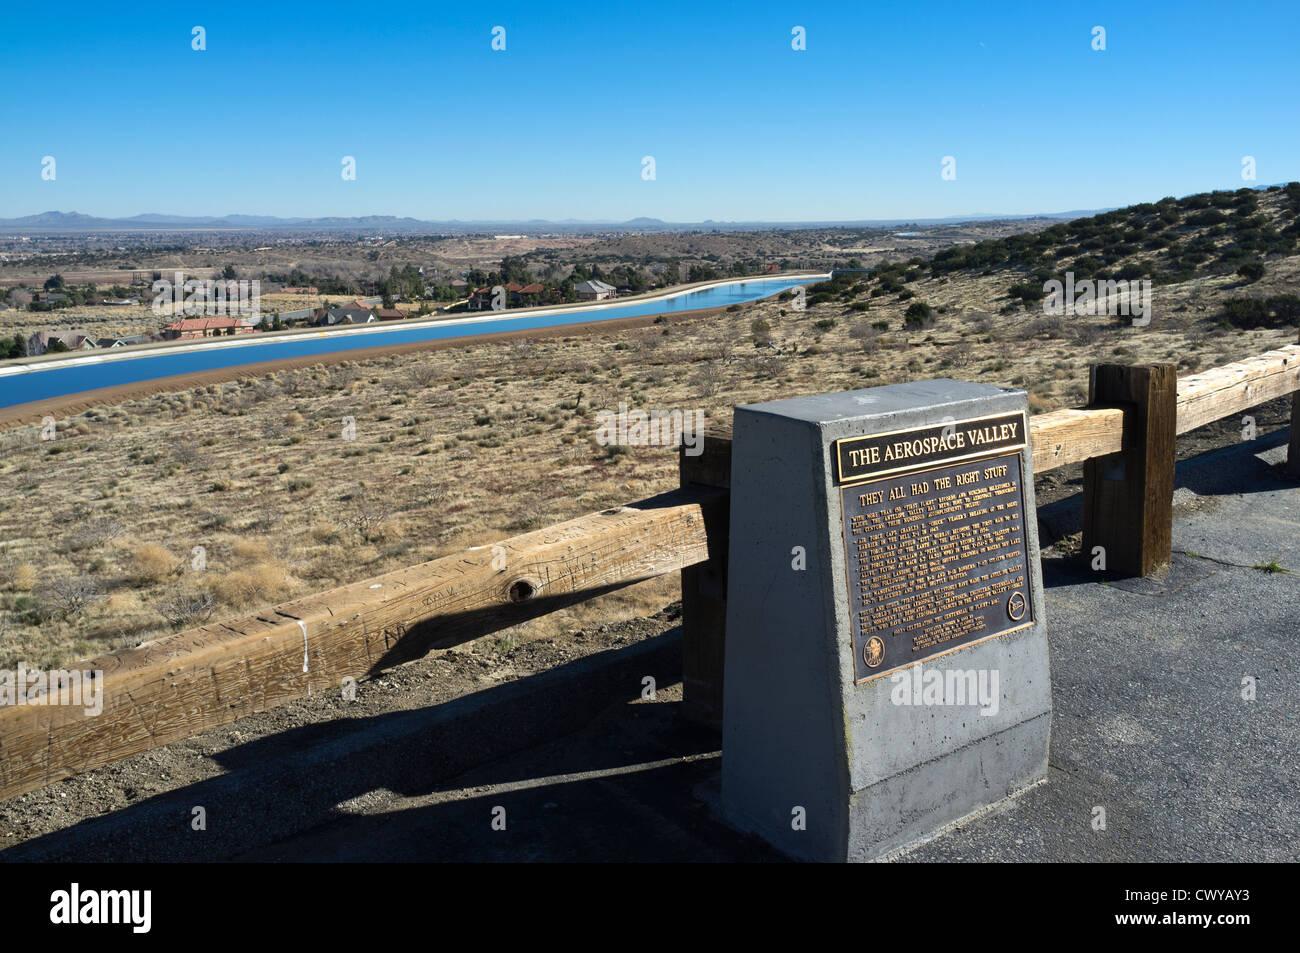 Antelope Valley, California site of many aerospace records. - Stock Image